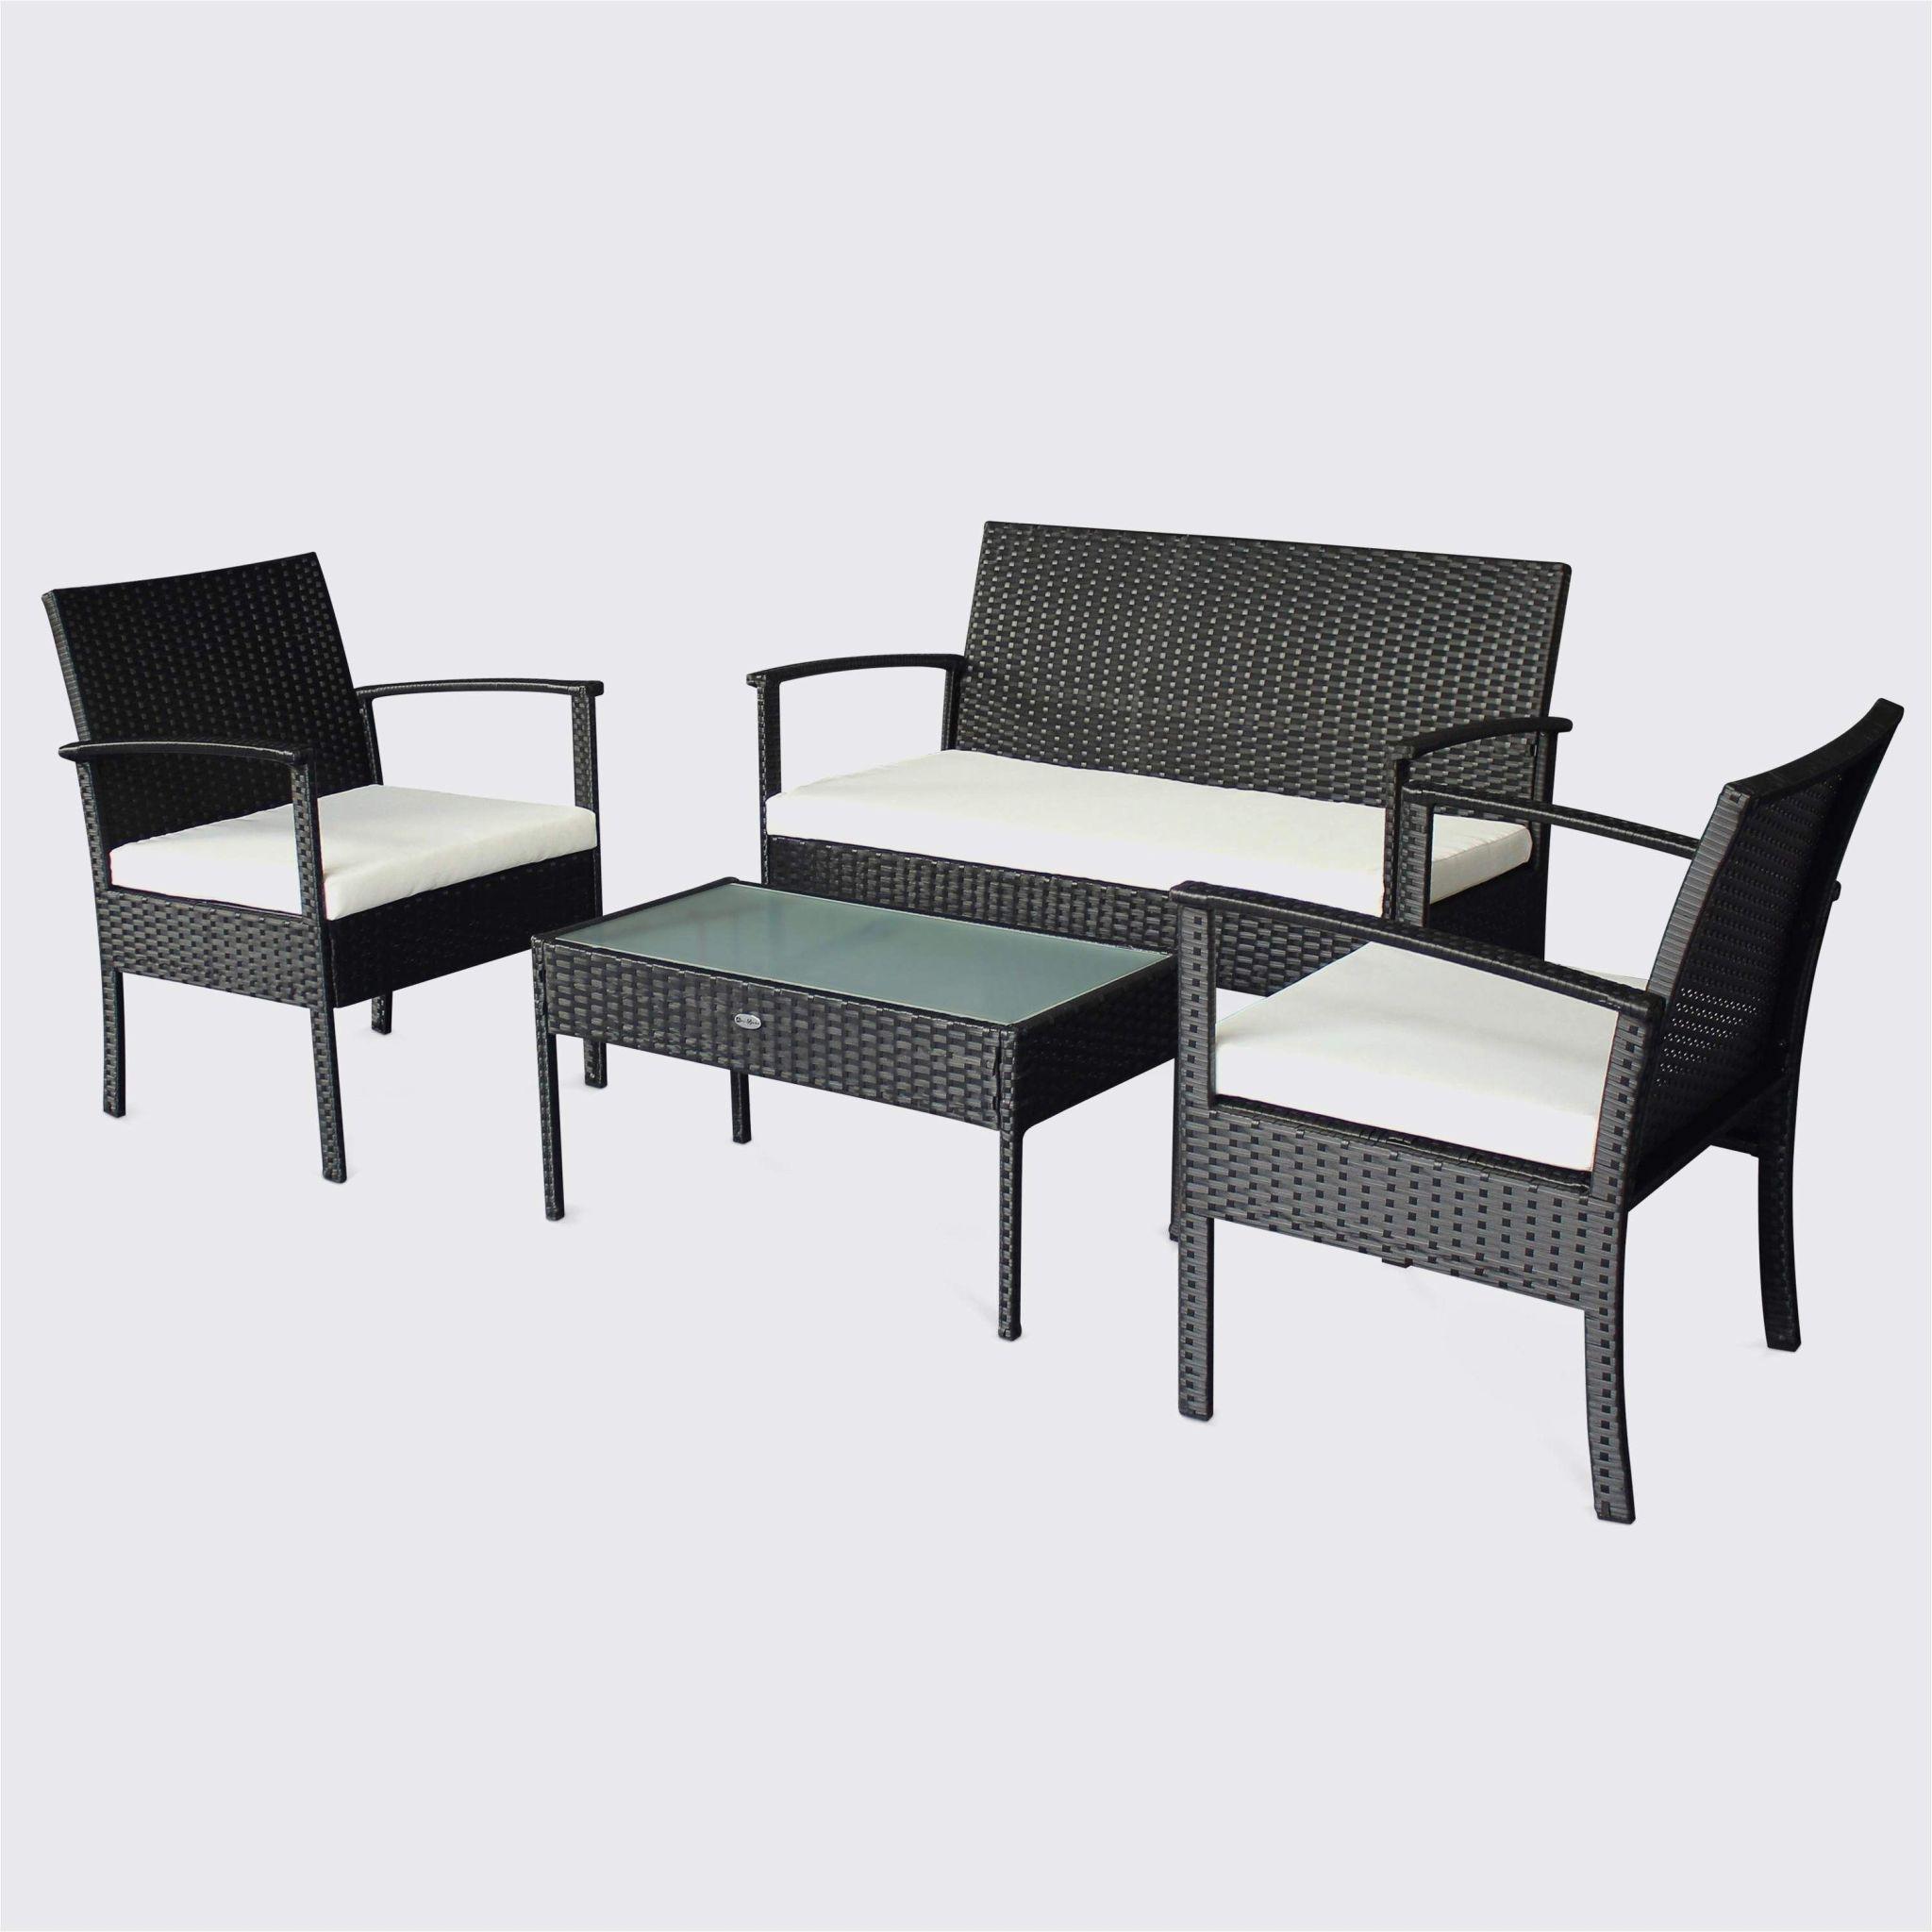 C Discount Salon De Jardin - Canalcncarauca destiné Table De Jardin En Solde